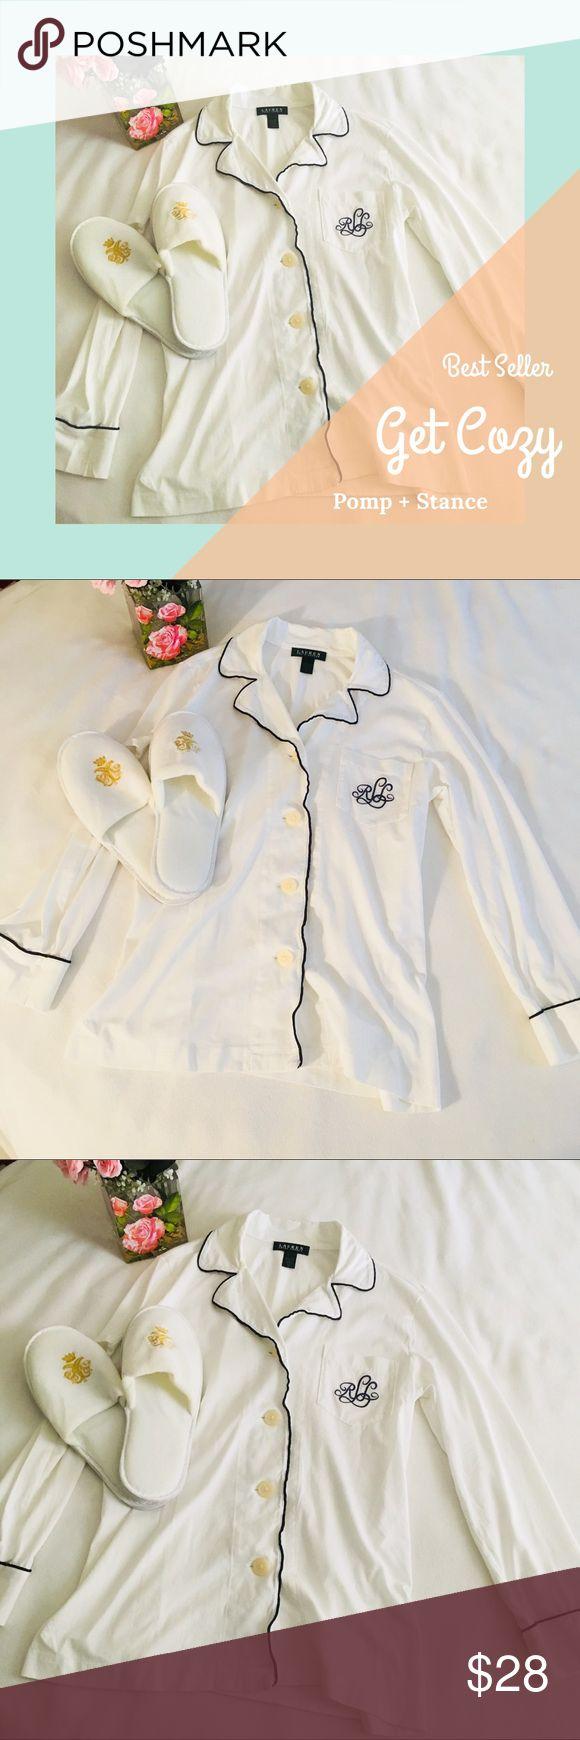 Super Ralph Lauren Monogram Spectator Sleep Shirt Super cute and classic white sleep shirt with blue trim and monogram in excellent condition Ralph Lauren Intimates & Sleepwear Pajamas